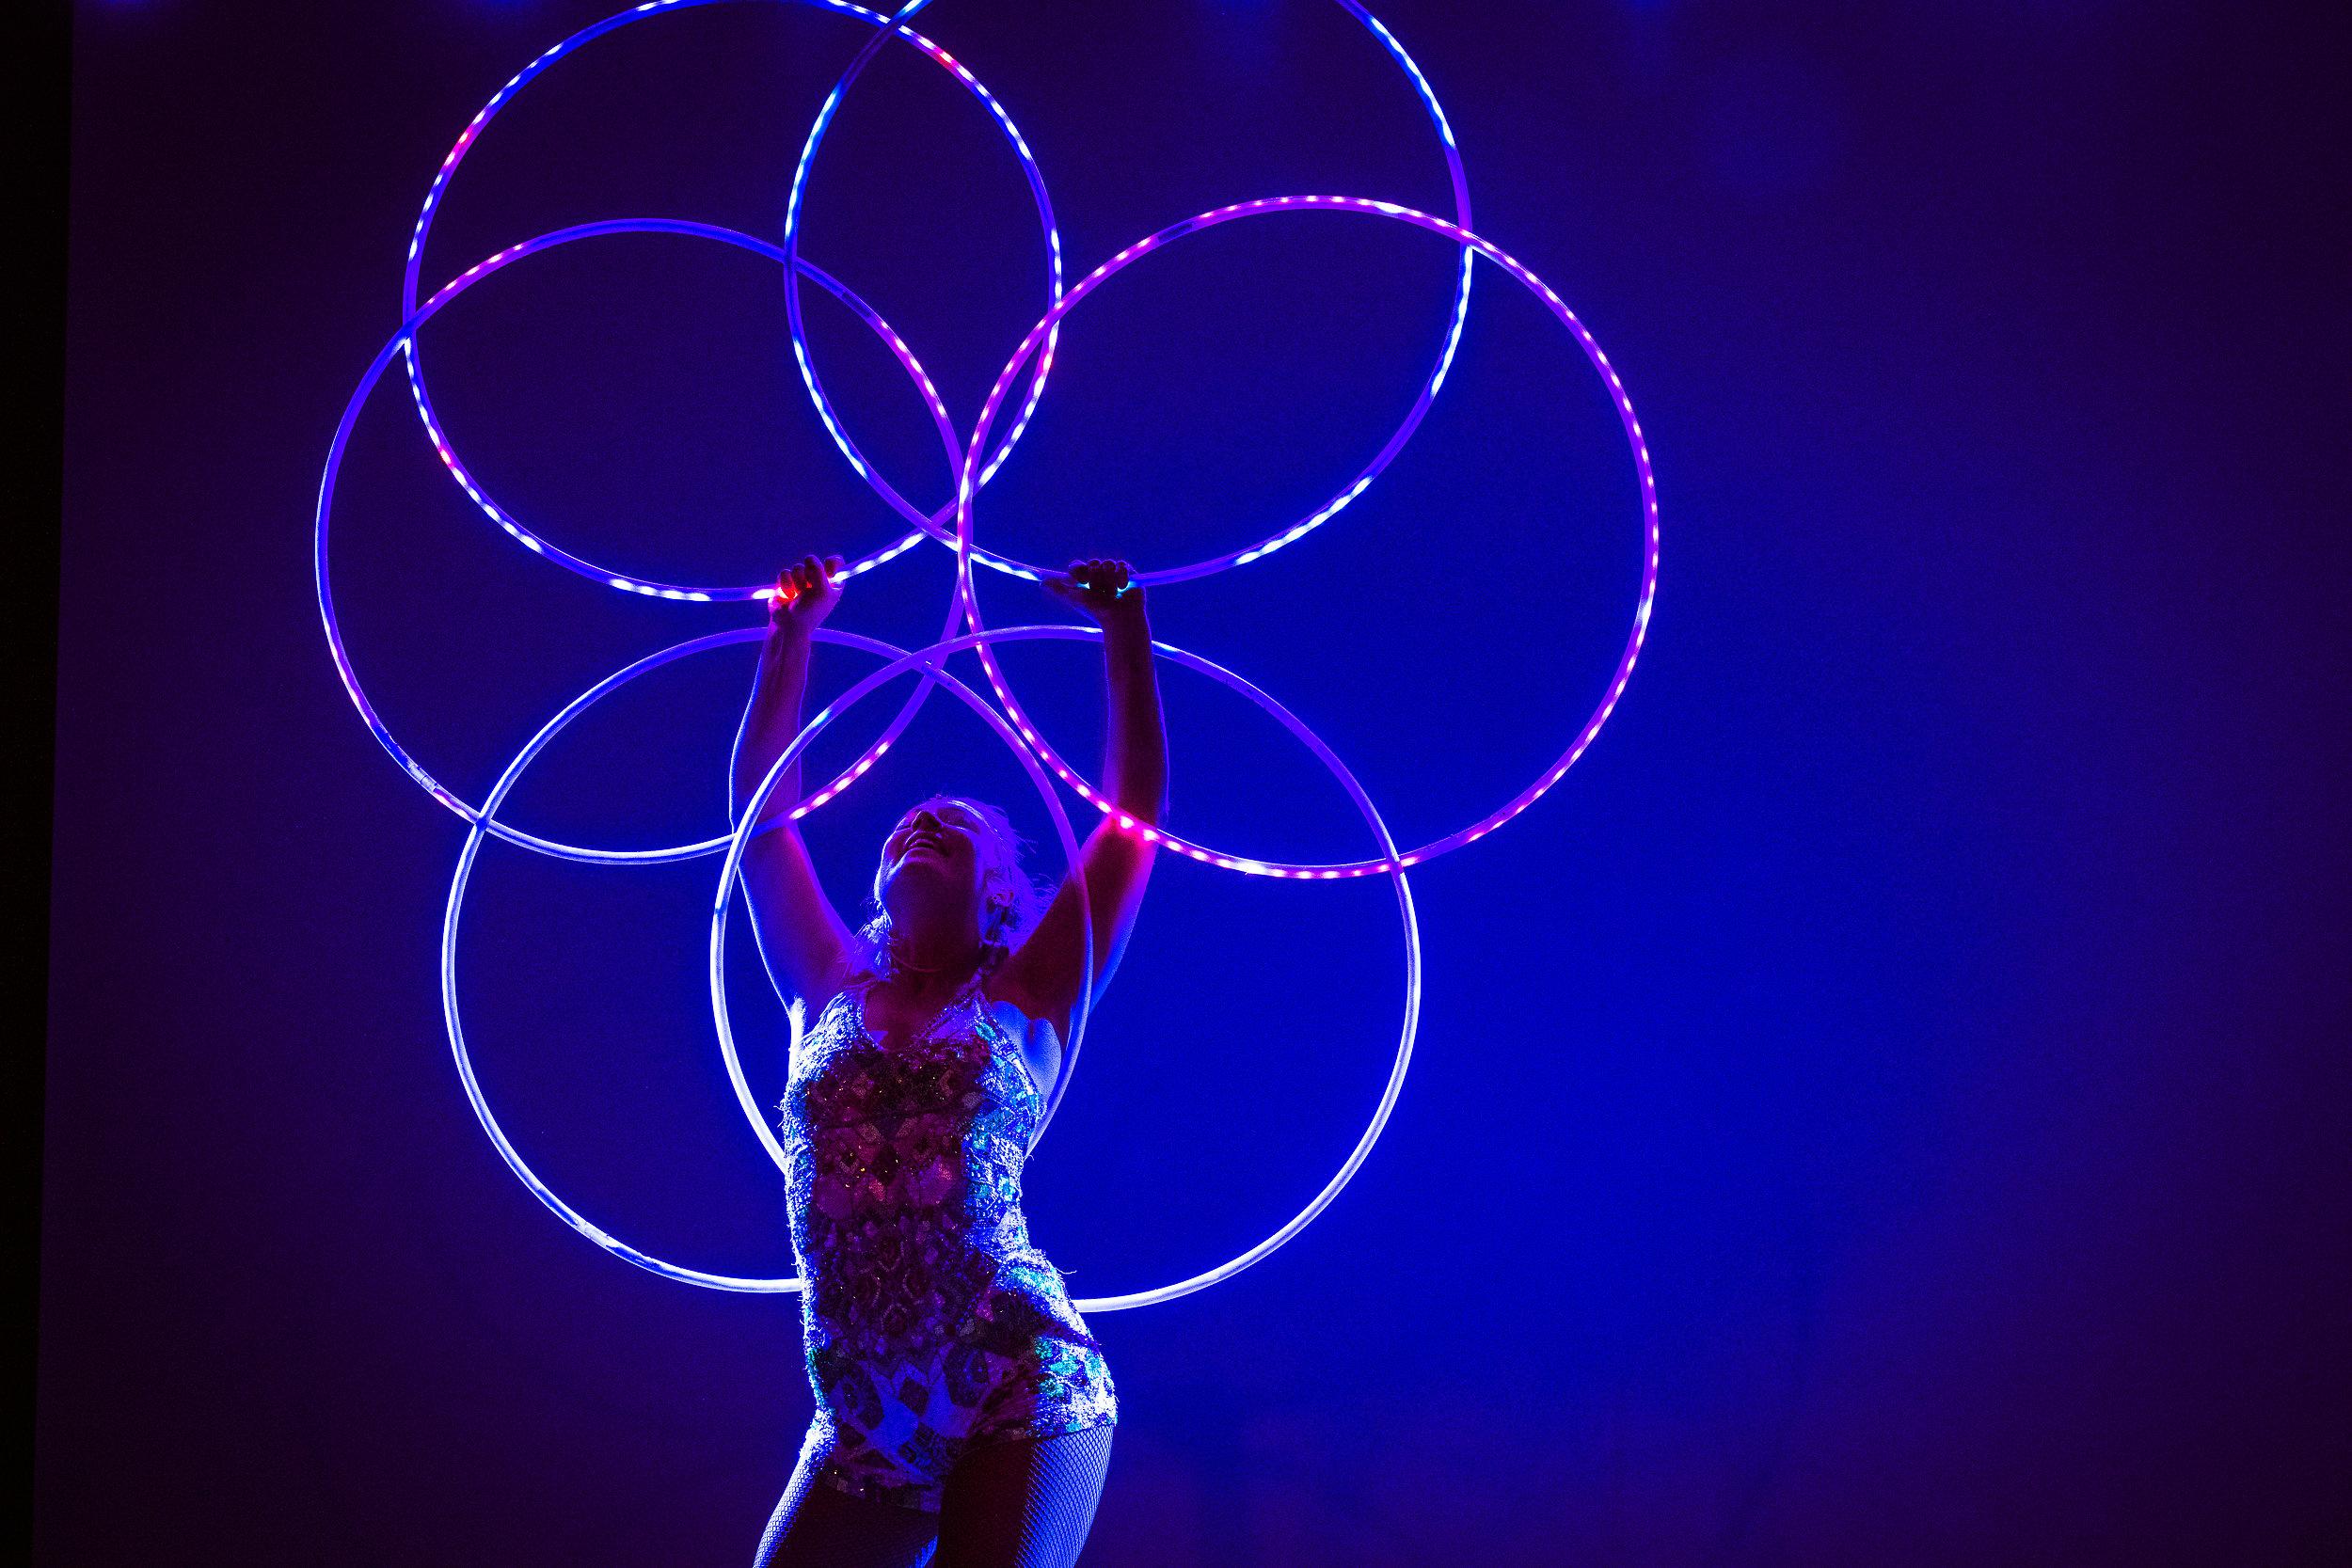 LED rockringar- Act of Emotion-  foto Julia Reinhart.jpg